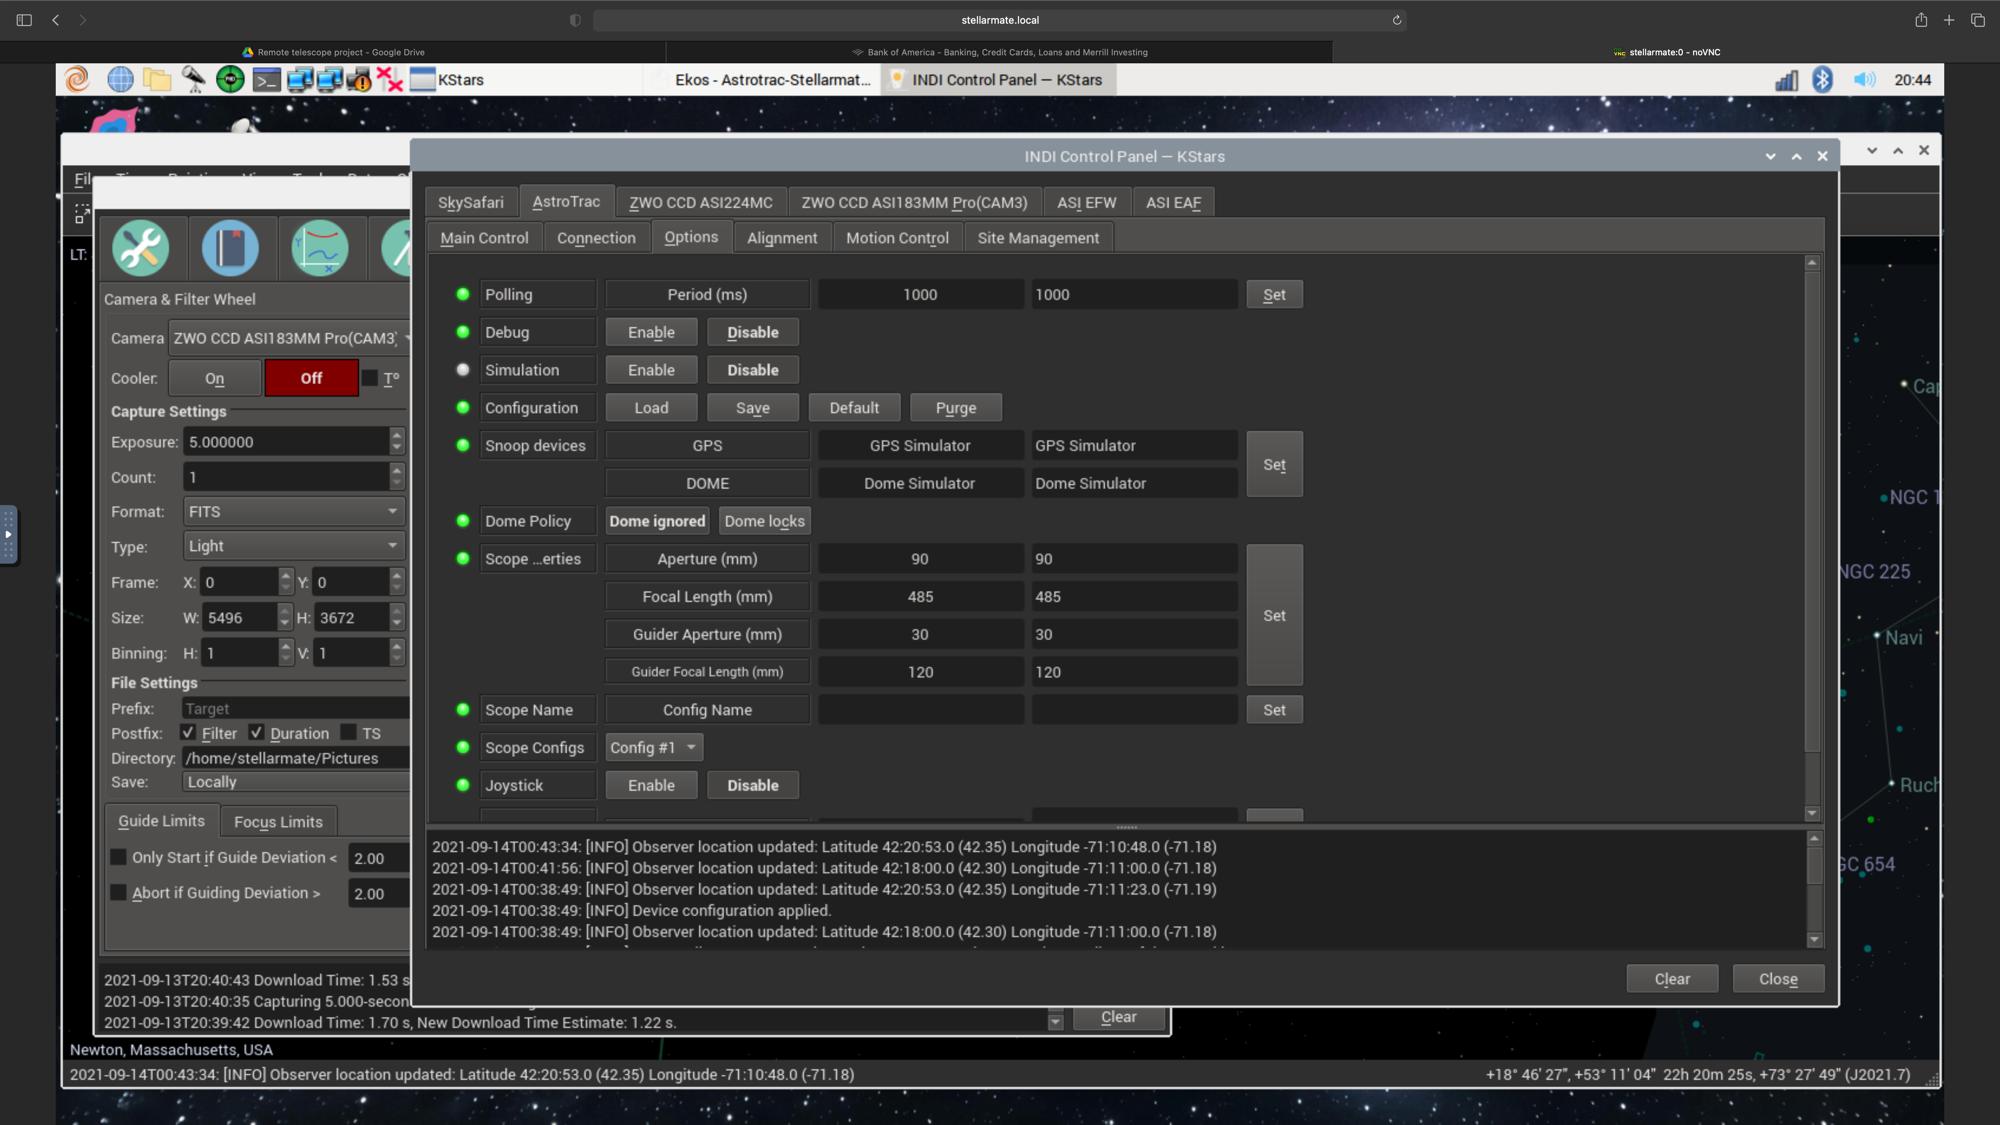 ScreenShot2021-09-13at8.44.46PM.png